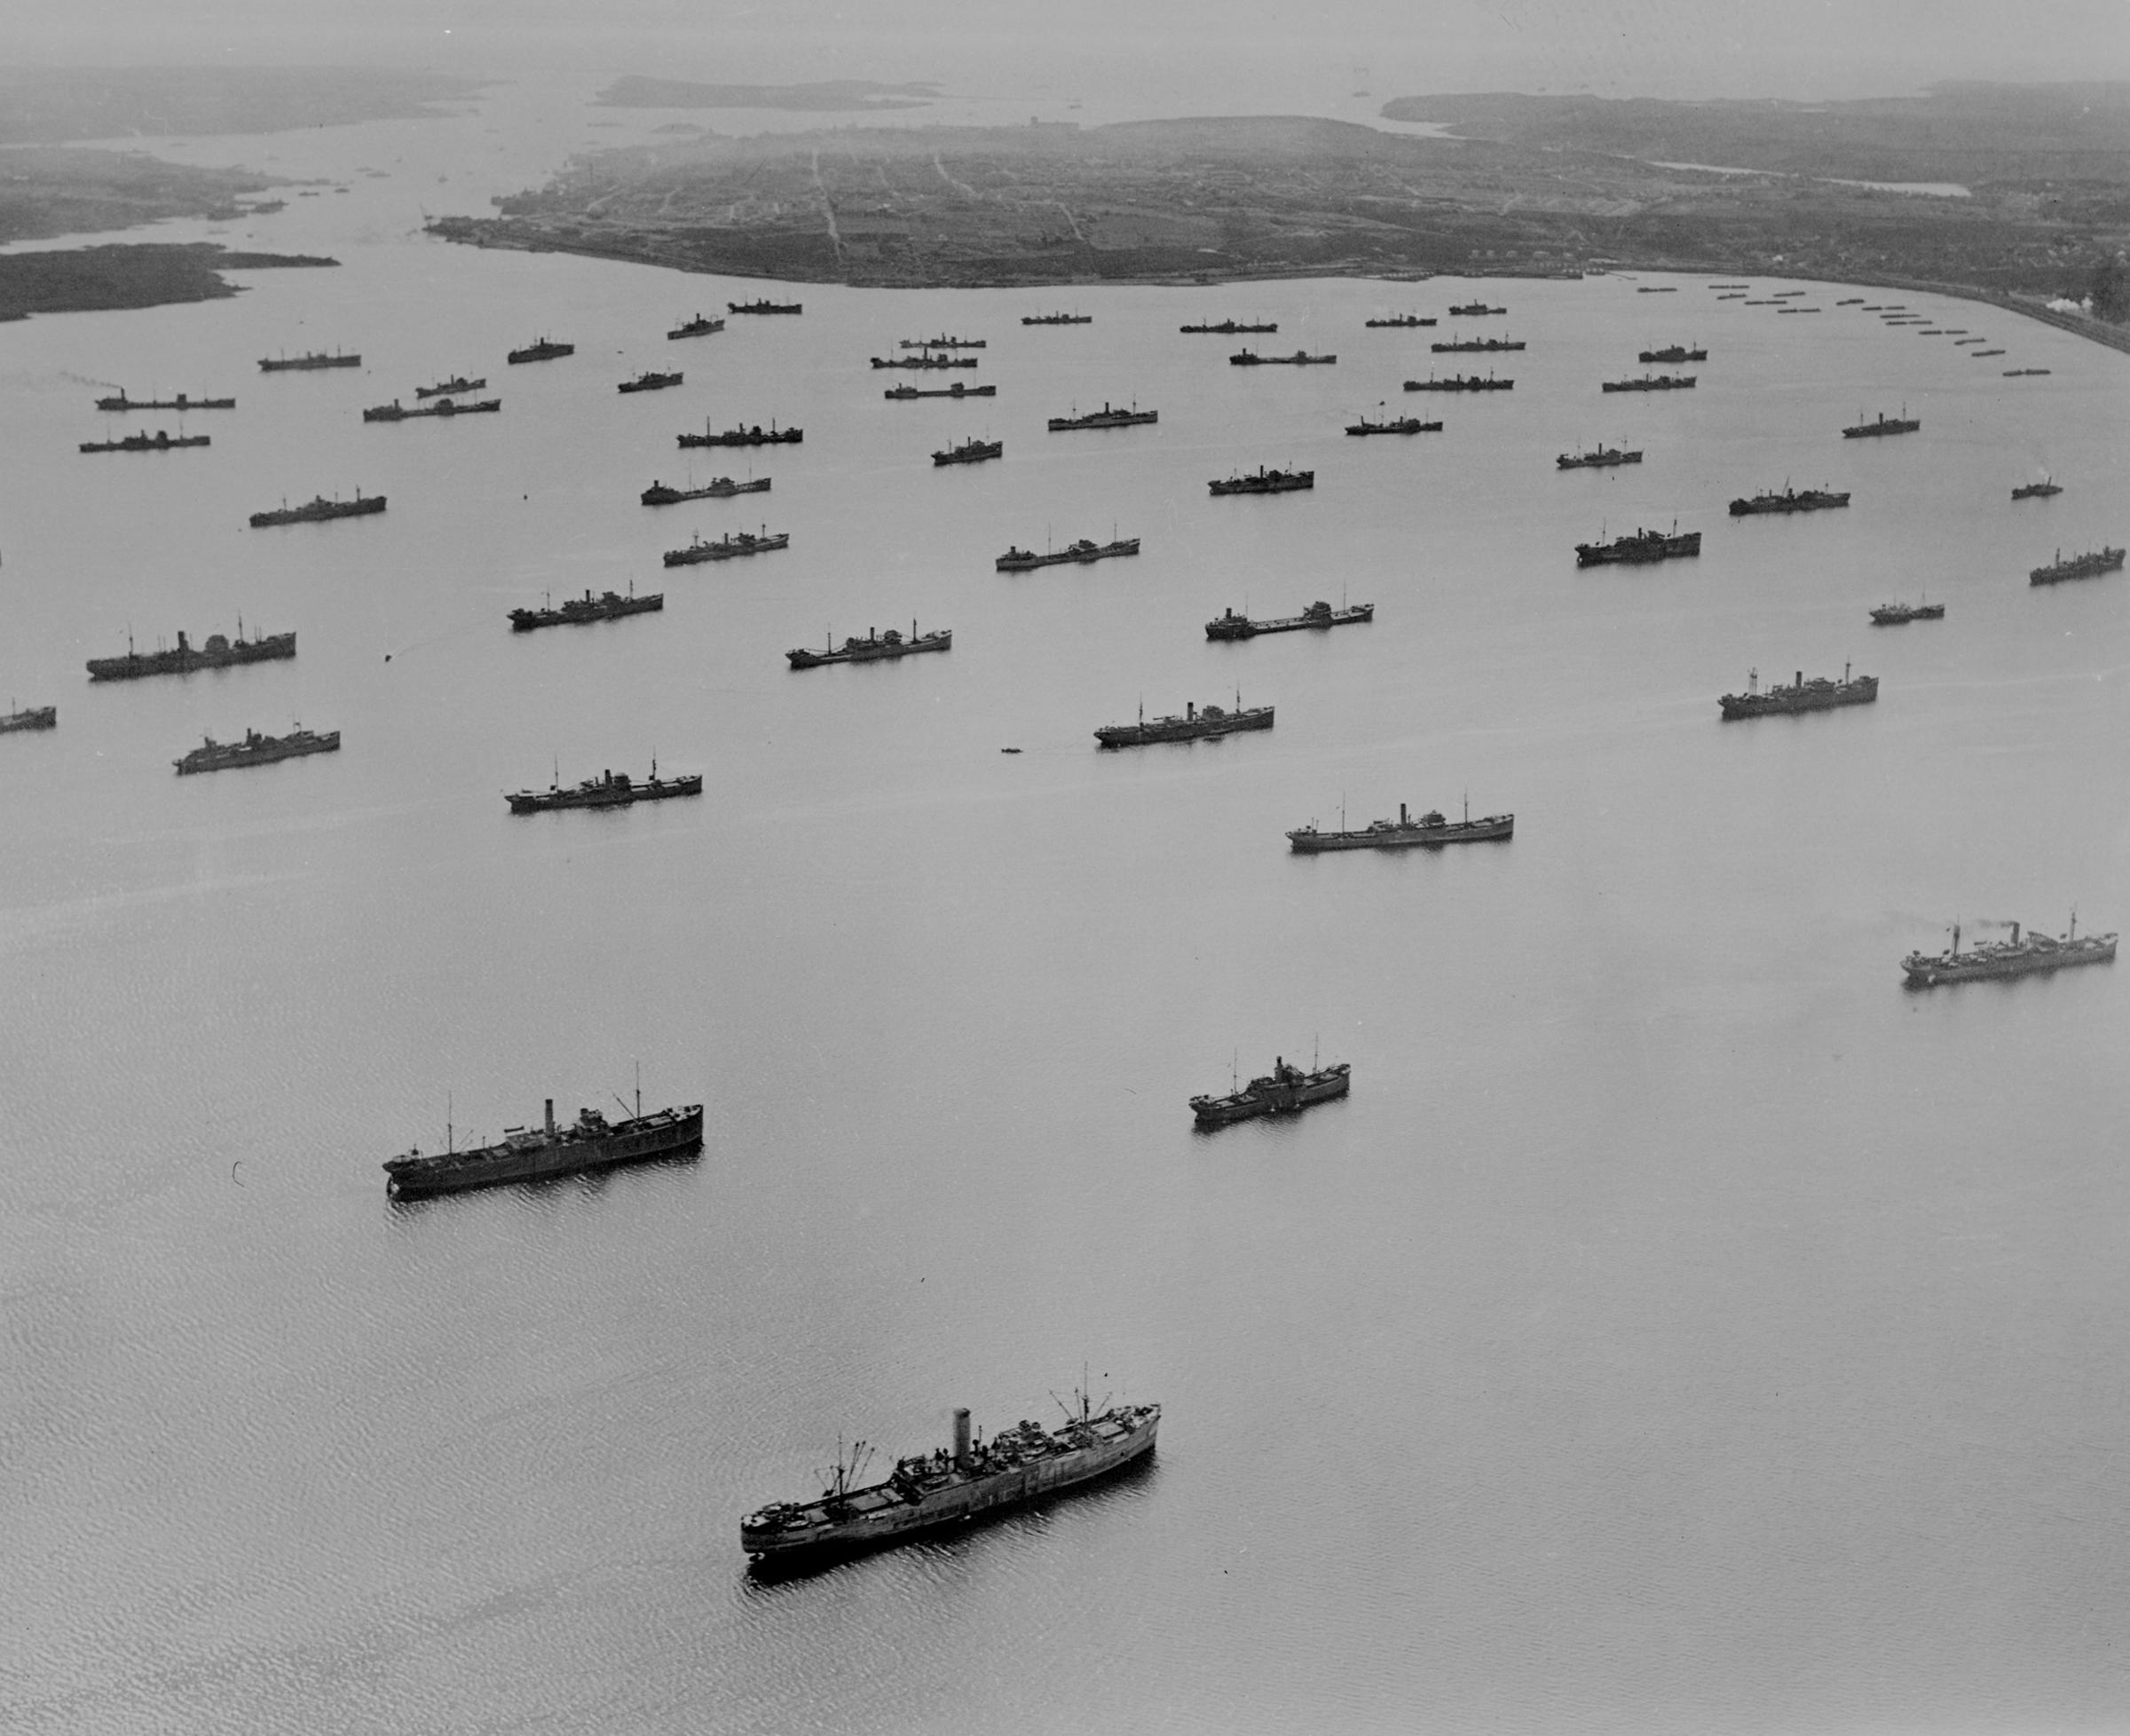 Prairie boys tossed at sea in WW II's longest battle